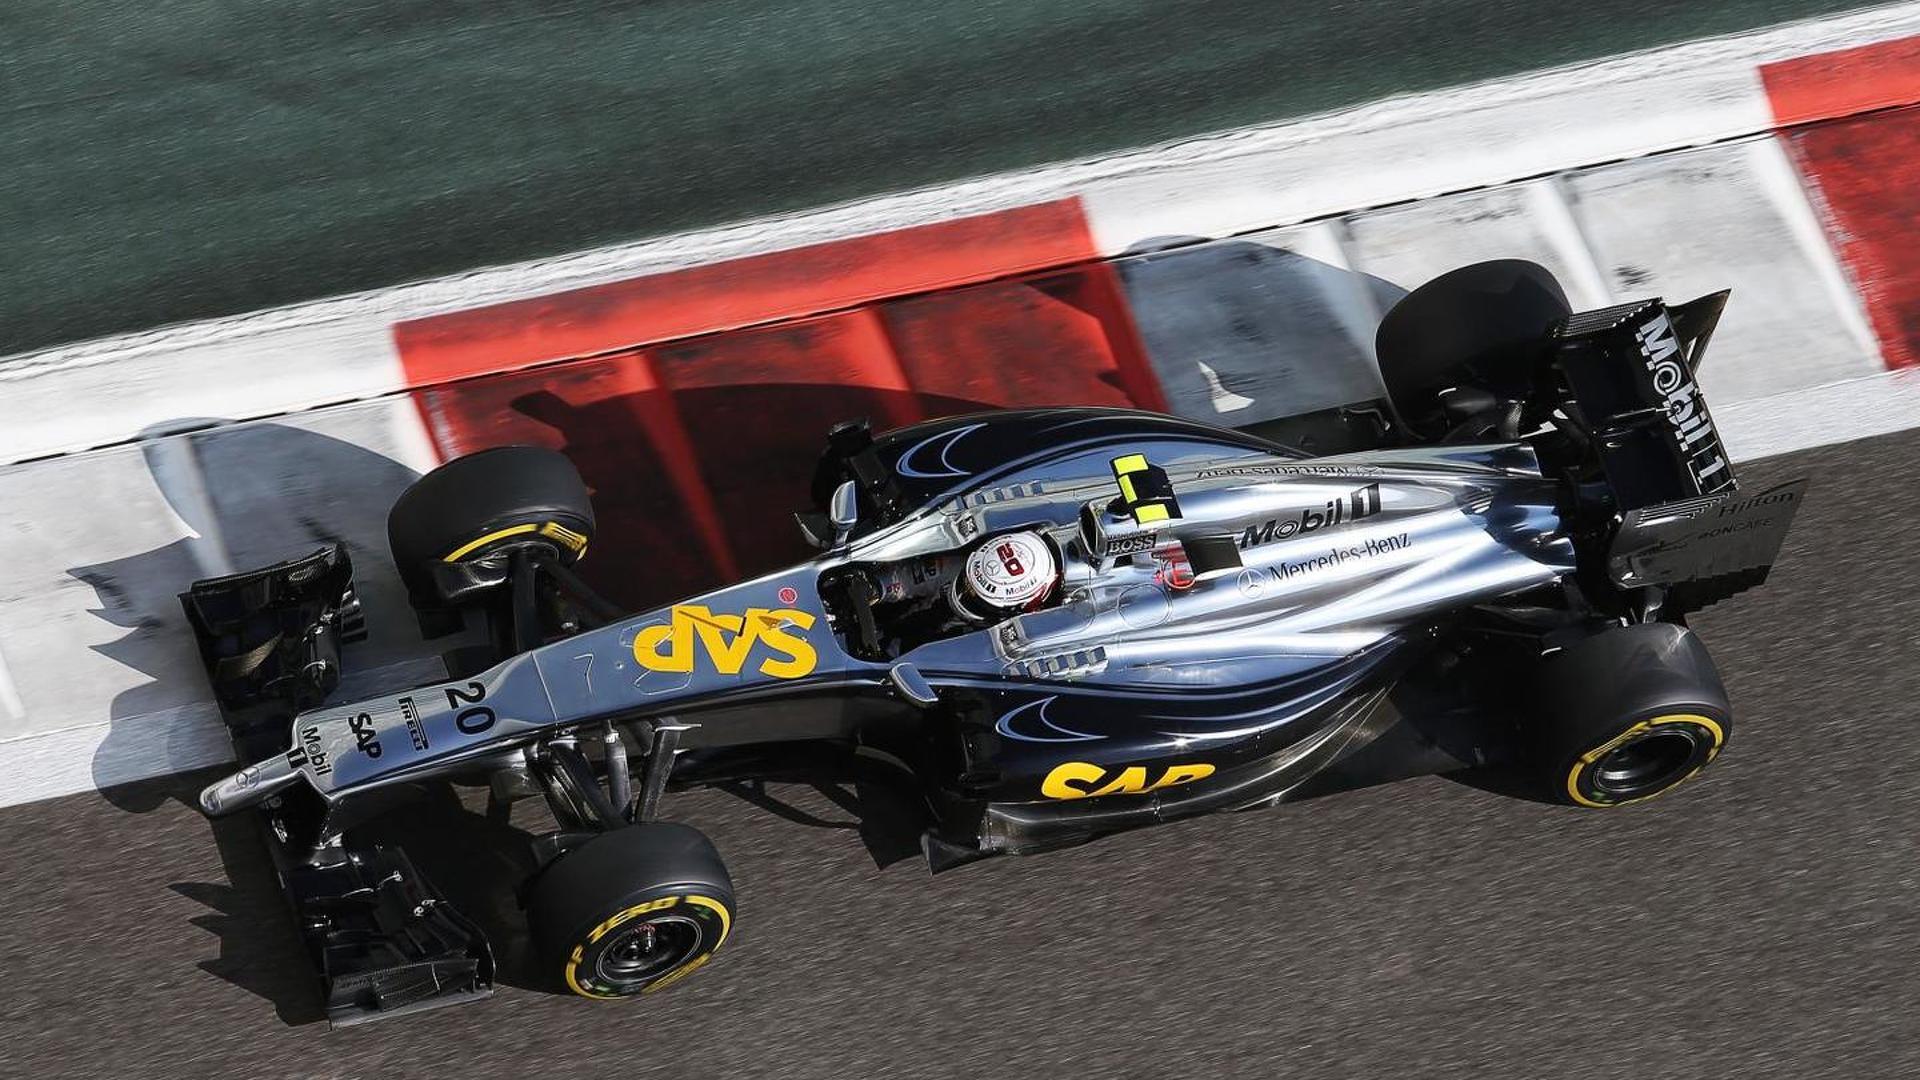 Denmark's Lego rules out McLaren deal